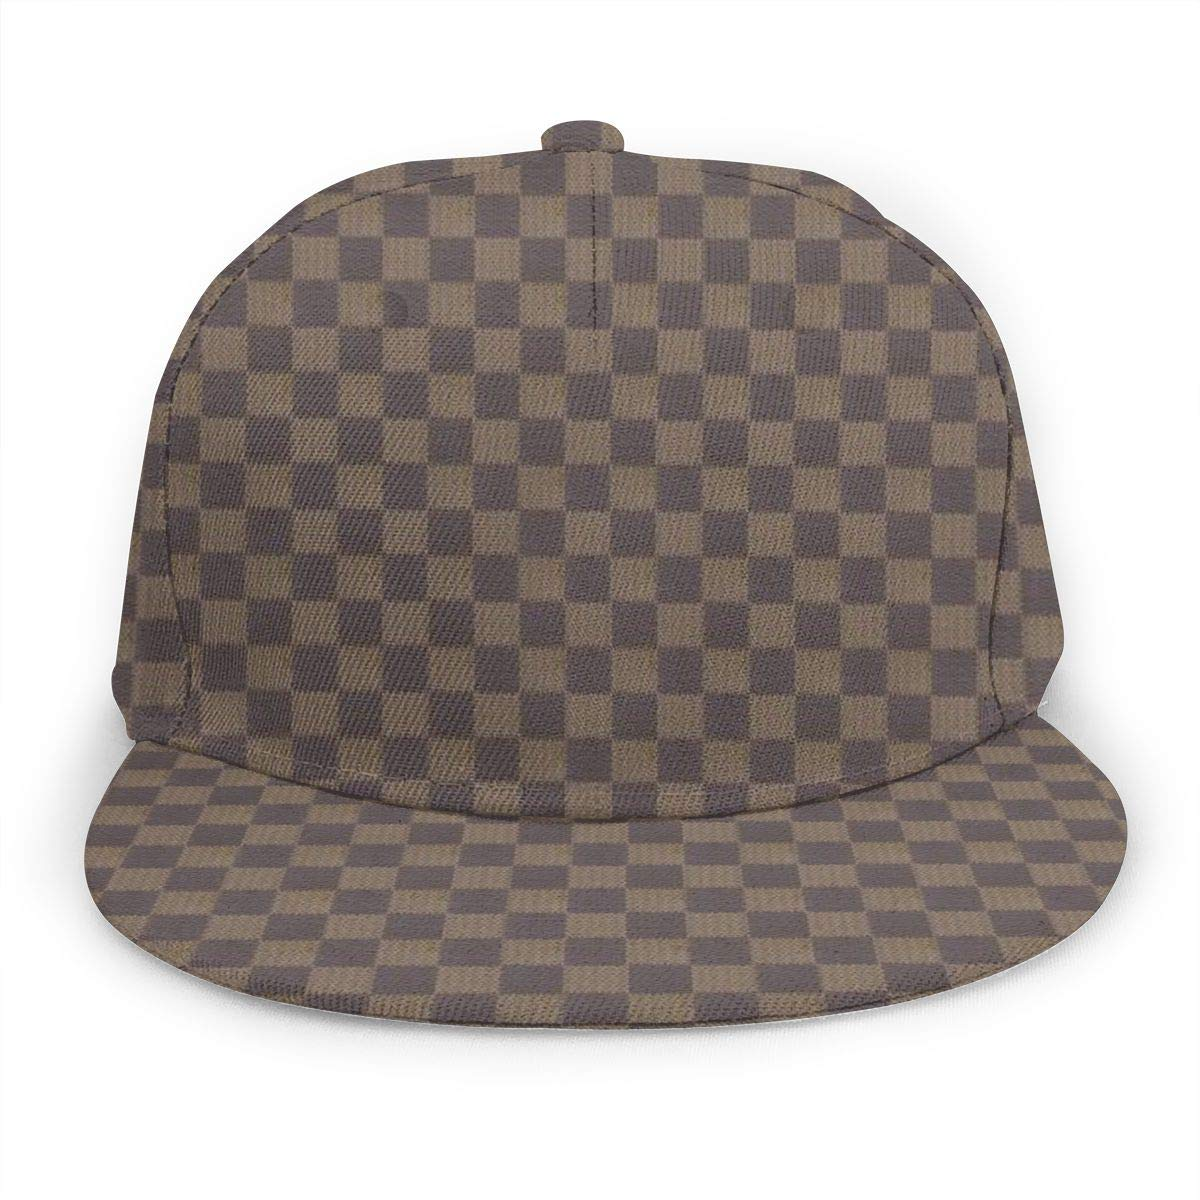 ELVg Unisex Classic Trucker Hat Adjustable Hip Hop Flat Bill Hat Dad Baseball Caps Black